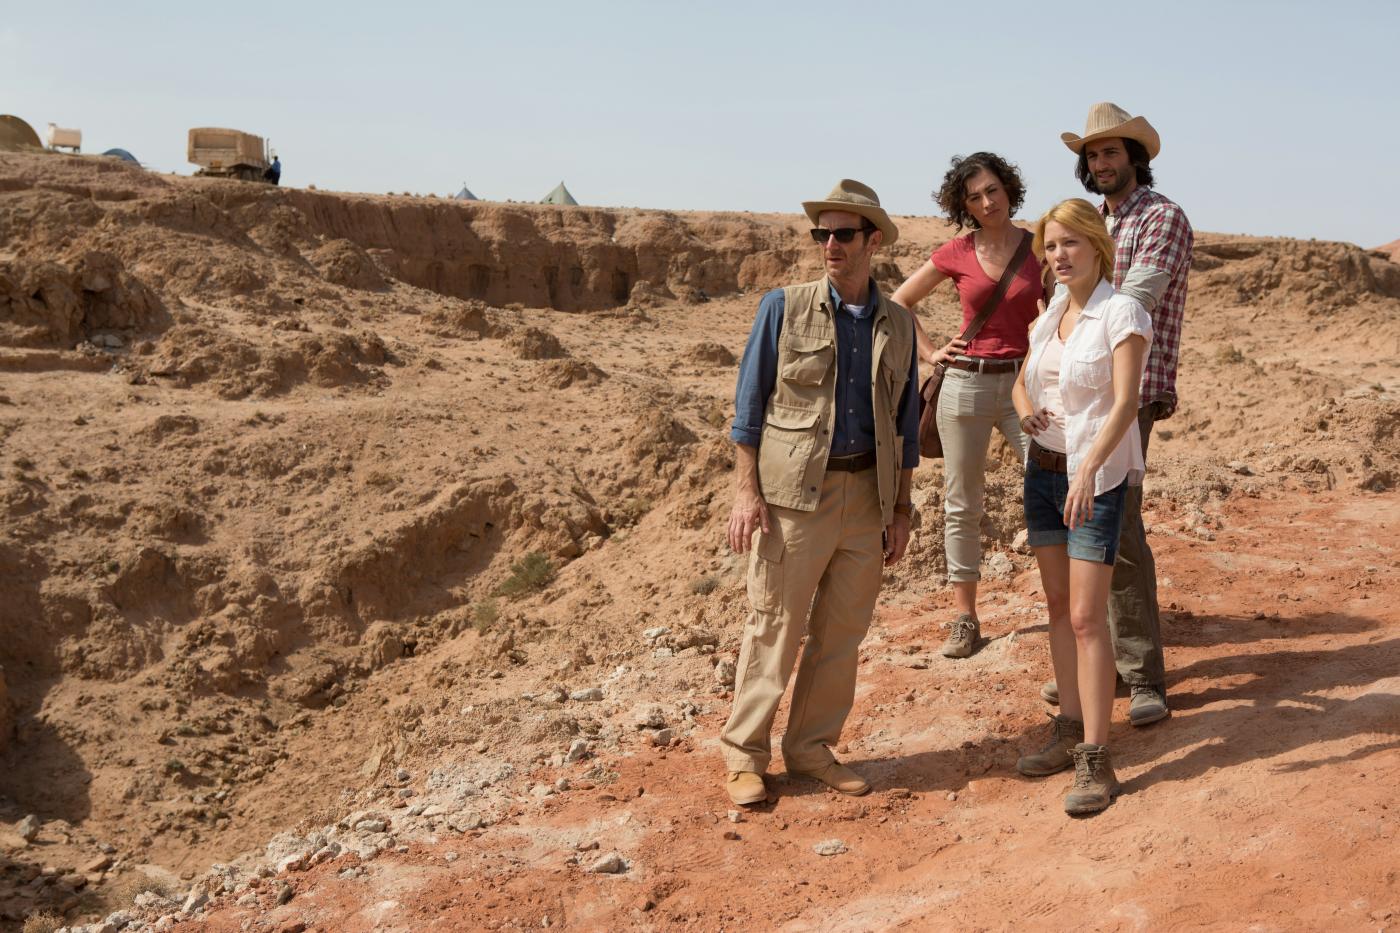 Pyramide-Film-Image-1